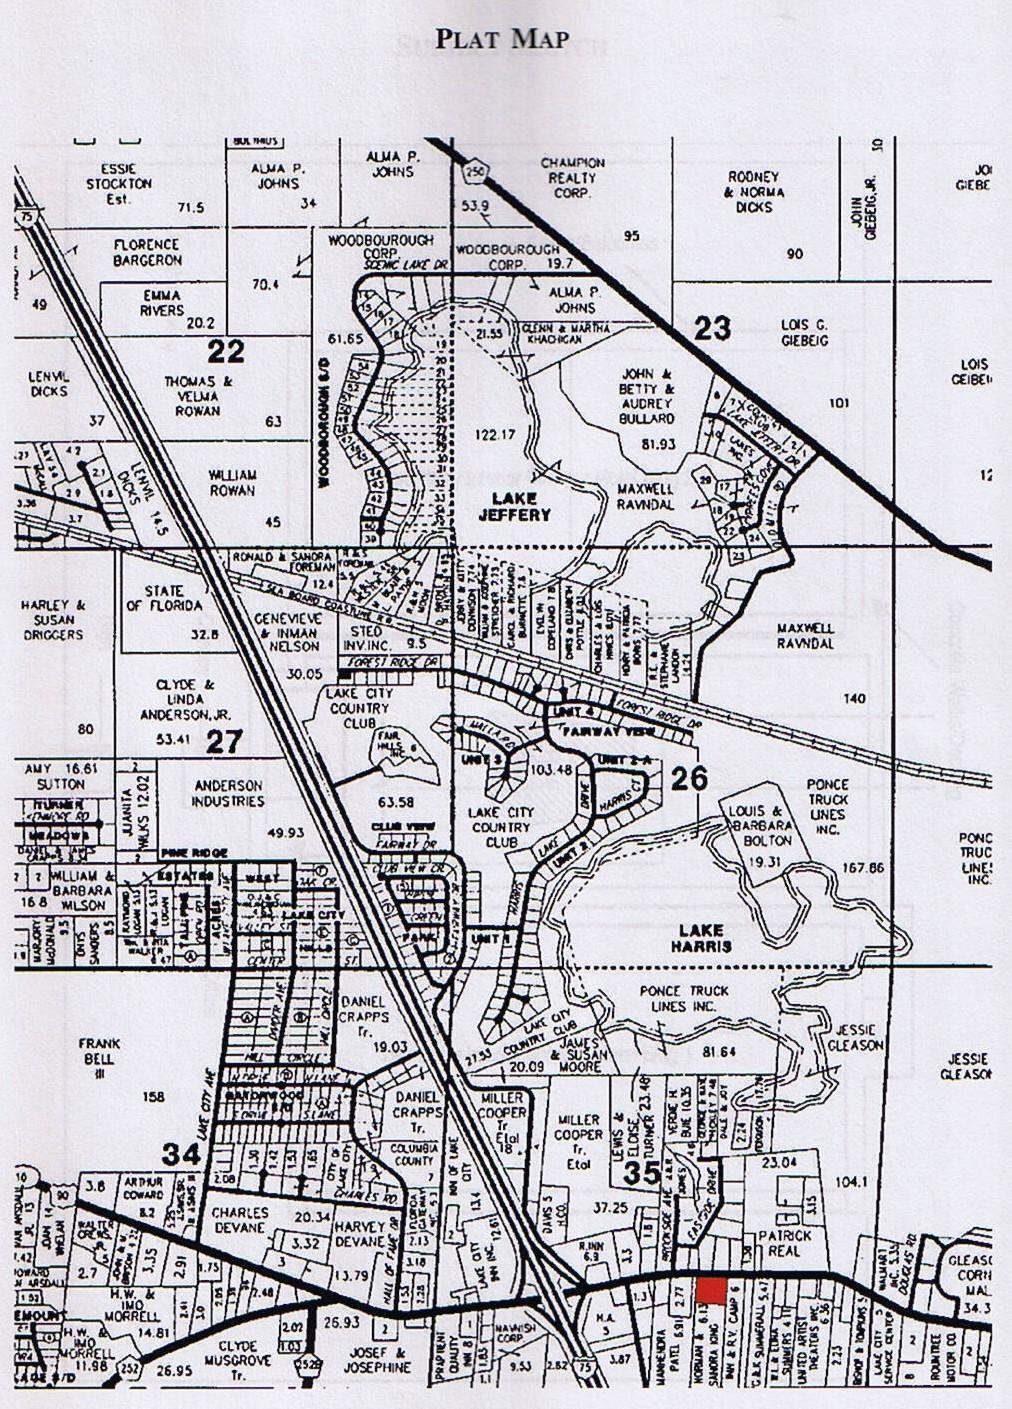 Florida Plat Maps.Florida Hotel Motel For Sale Florida Commercial Property